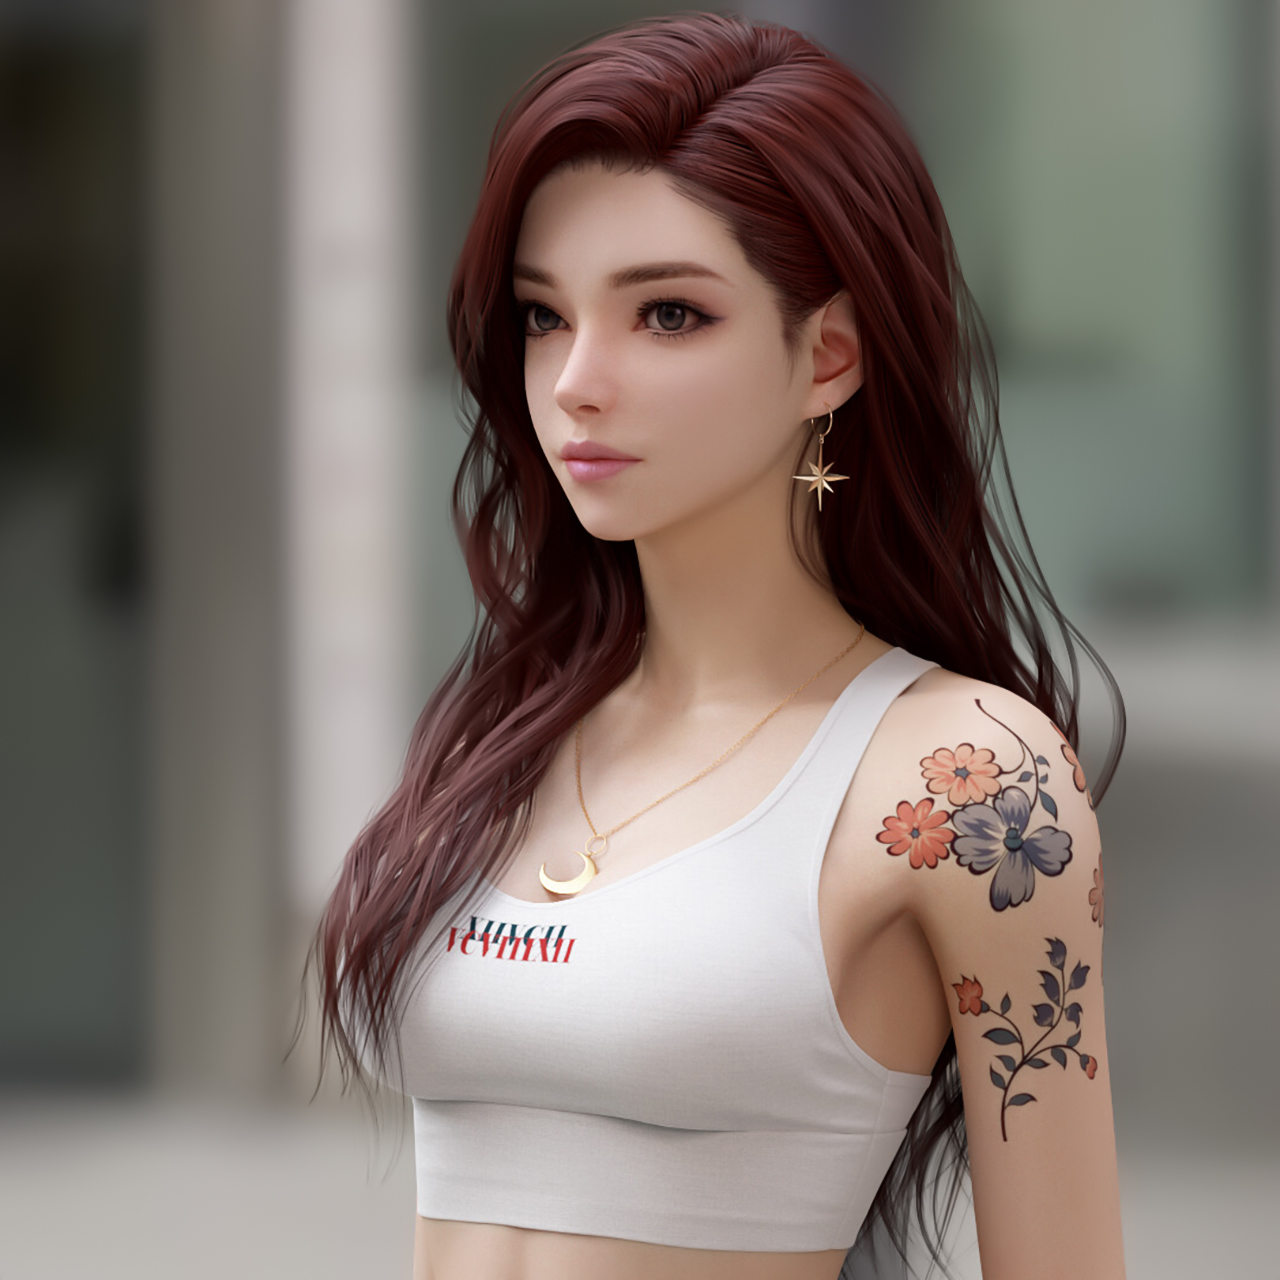 Shin JeongHo CGi Women Redhead Tank Top White Clothing Necklace Long Hair Looking Away Tattoo Depth  1280x1280